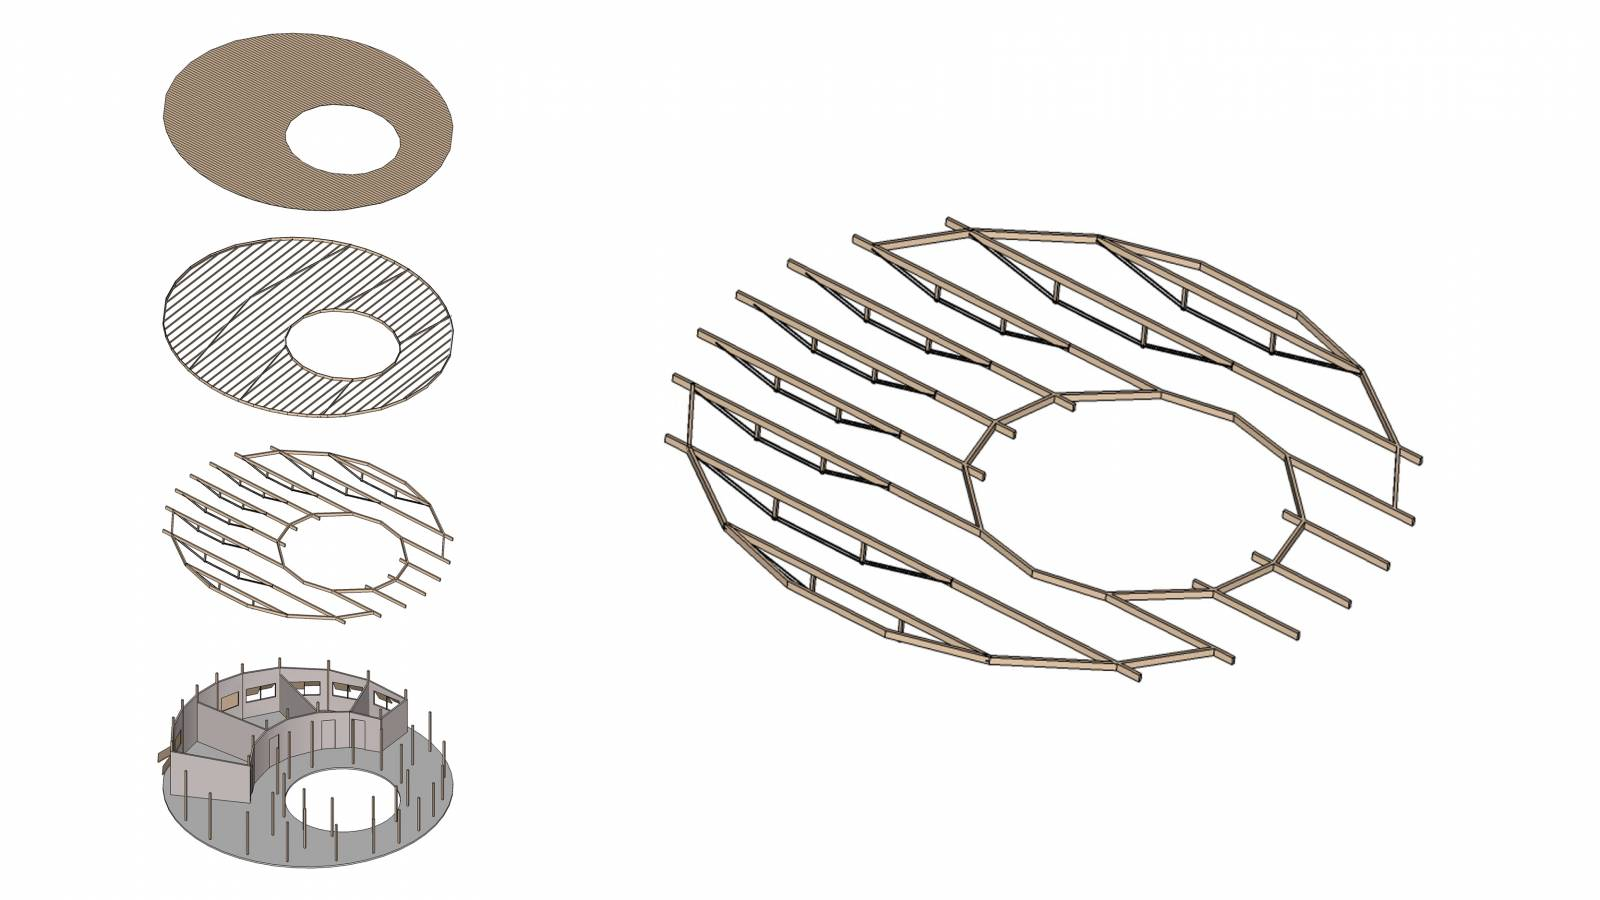 AXONOMETRIC PROJECTION - Igapó-Açu School - SPOL Architects